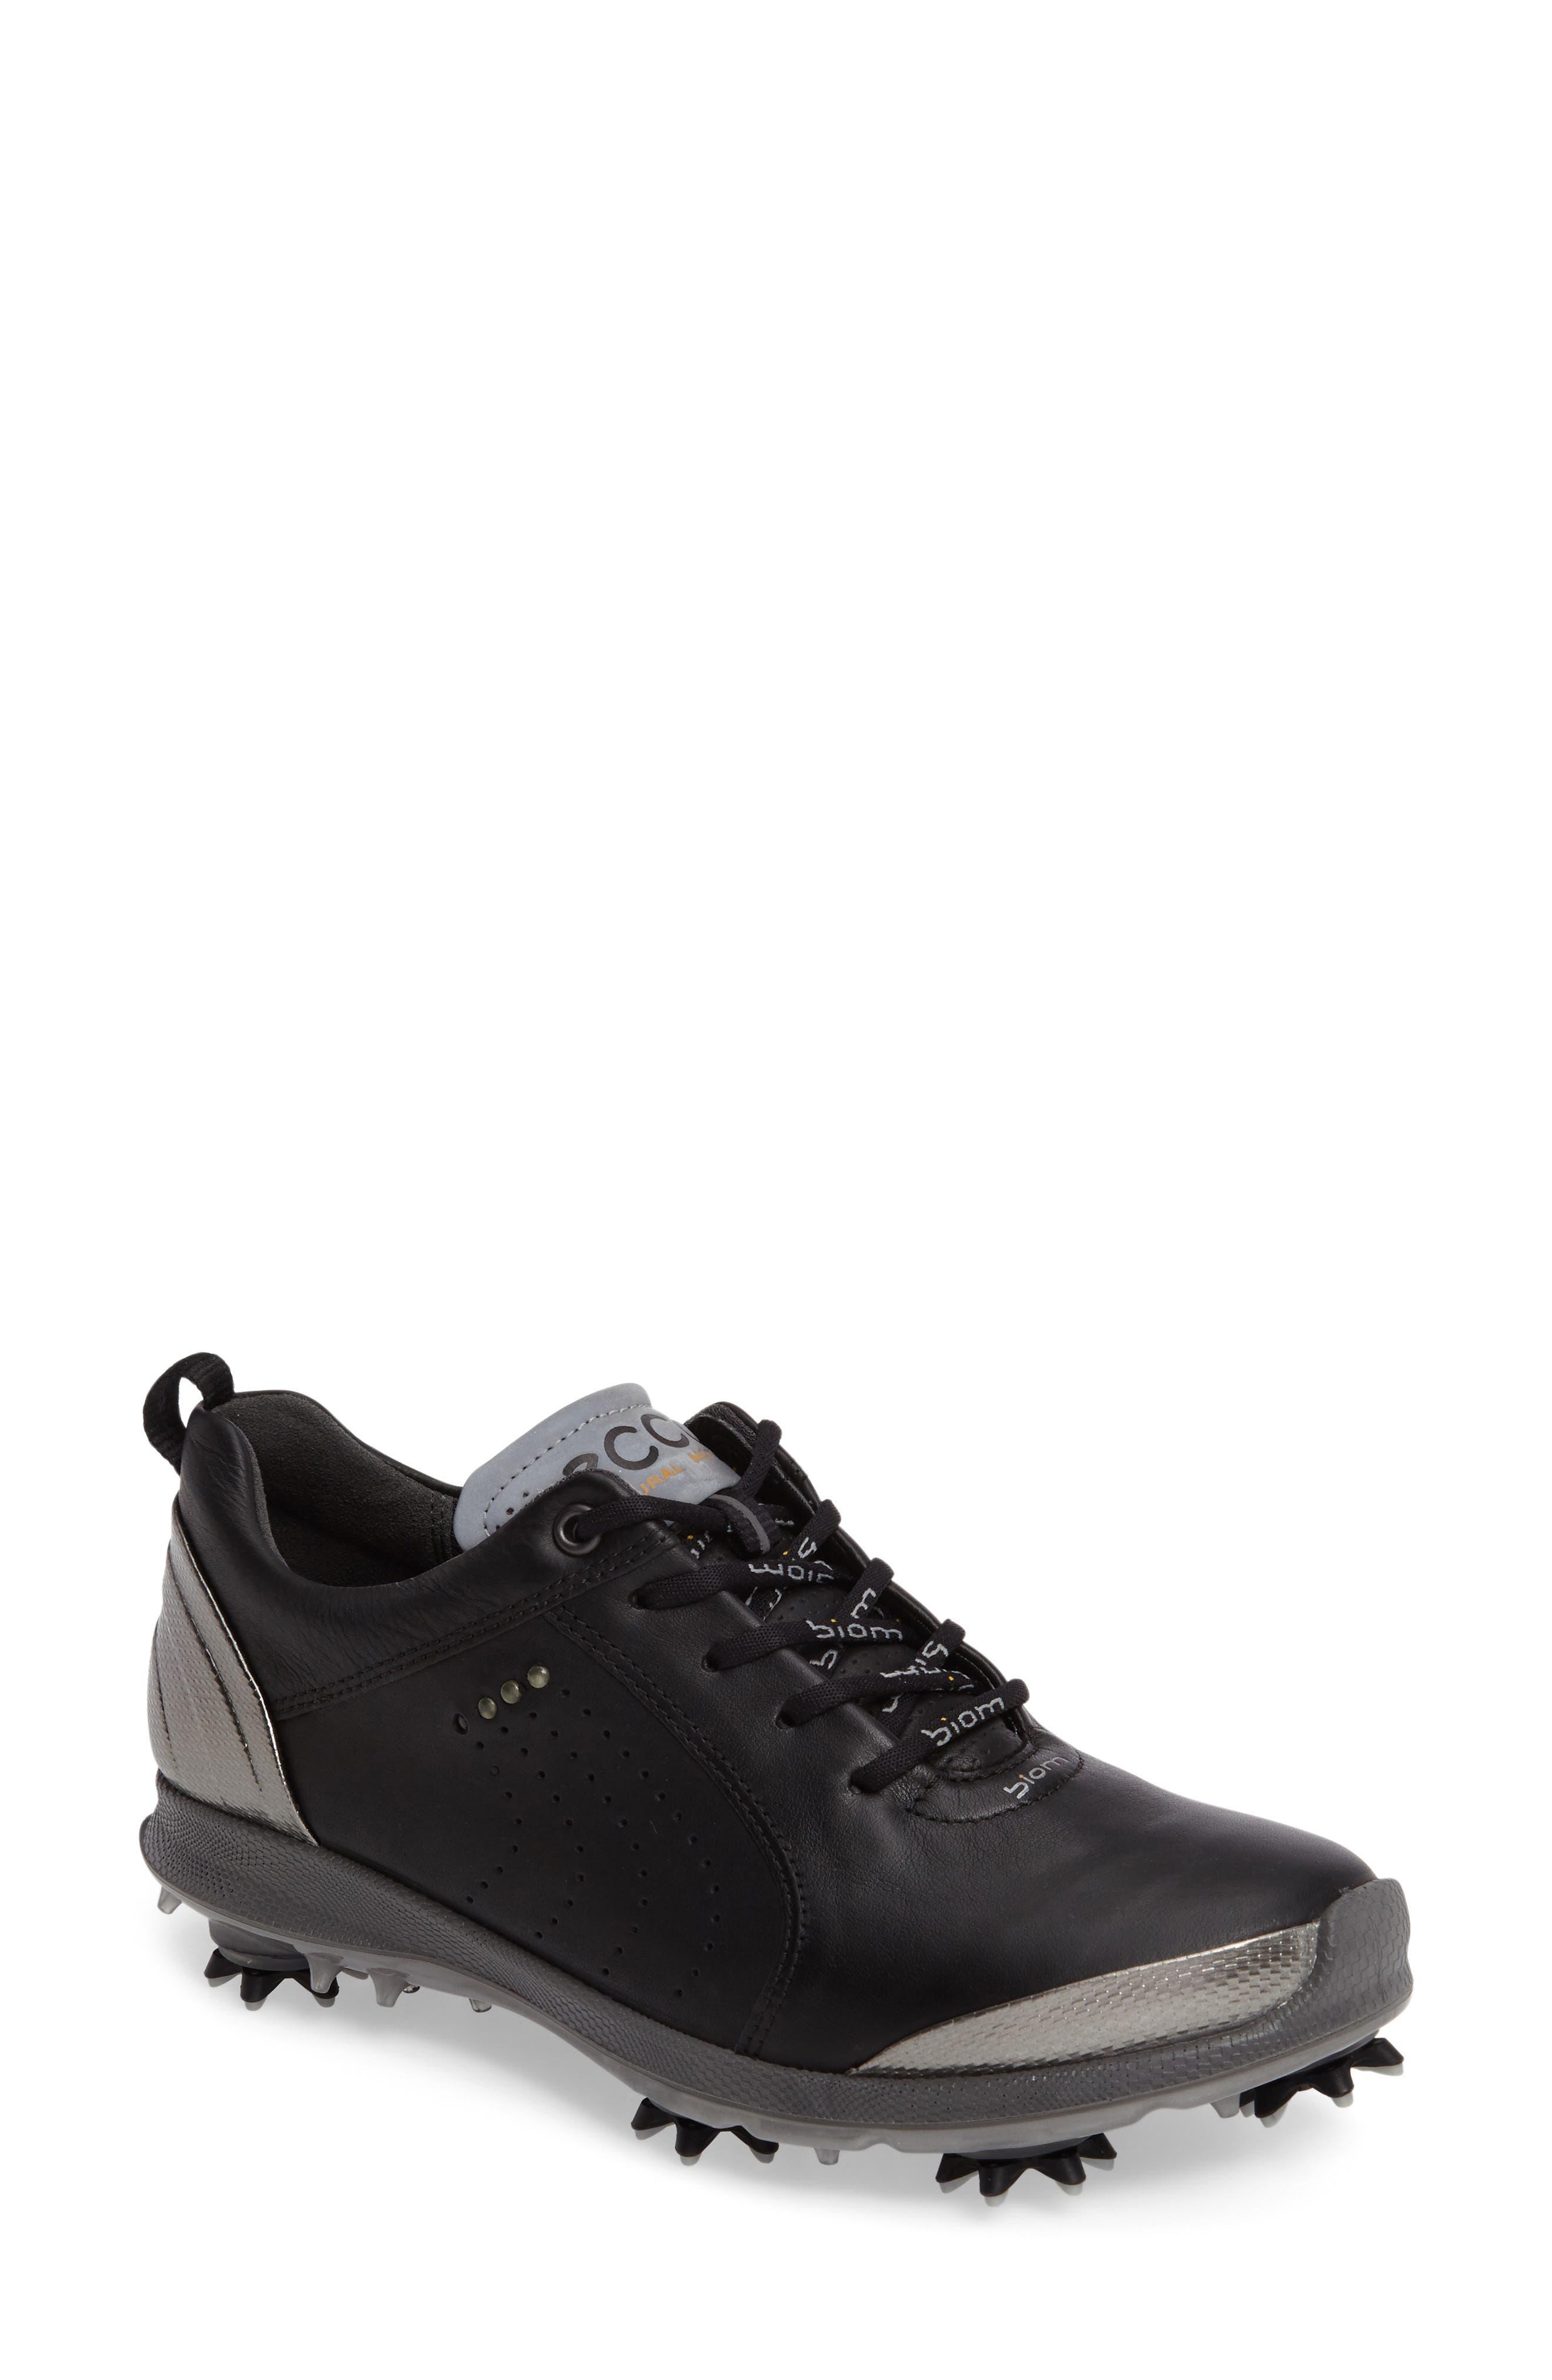 BIOM 2 Waterproof Golf Shoe,                             Main thumbnail 1, color,                             BLACK/ BUFFED SILVER LEATHER